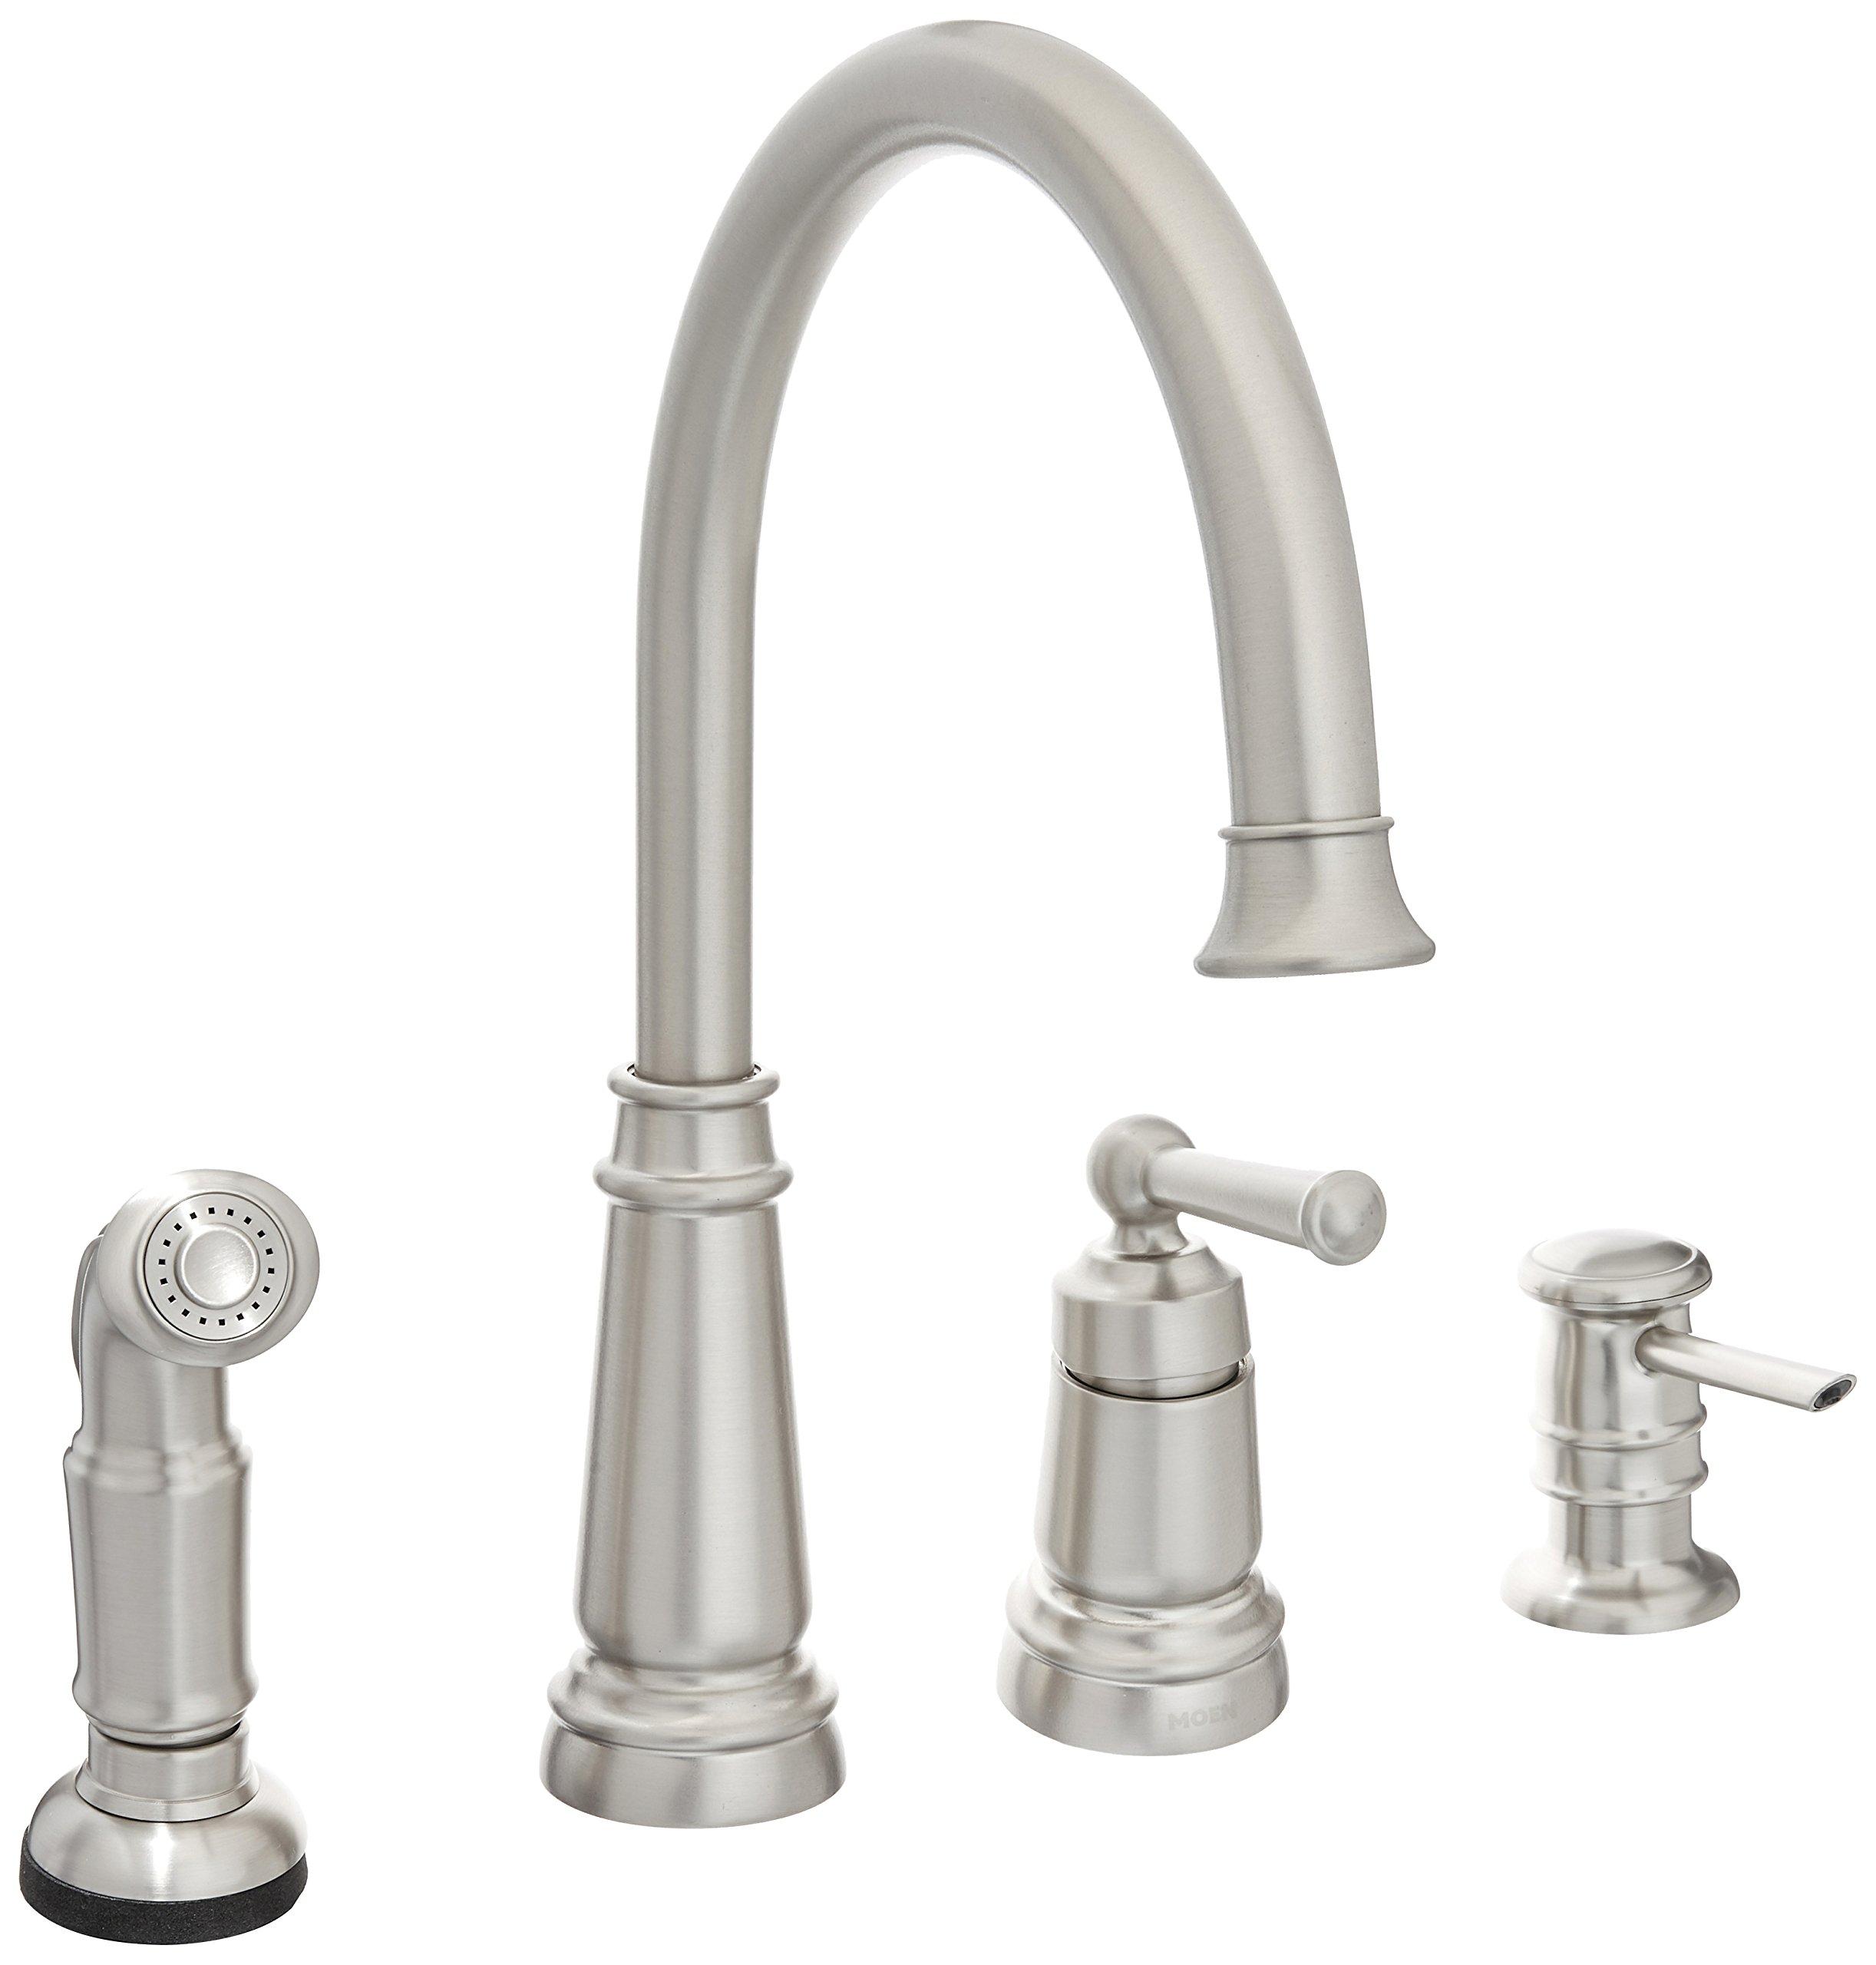 Moen 87042SRS Edison One-Handle High Arc Kitchen Faucet, Spot Resist Stainless by Moen